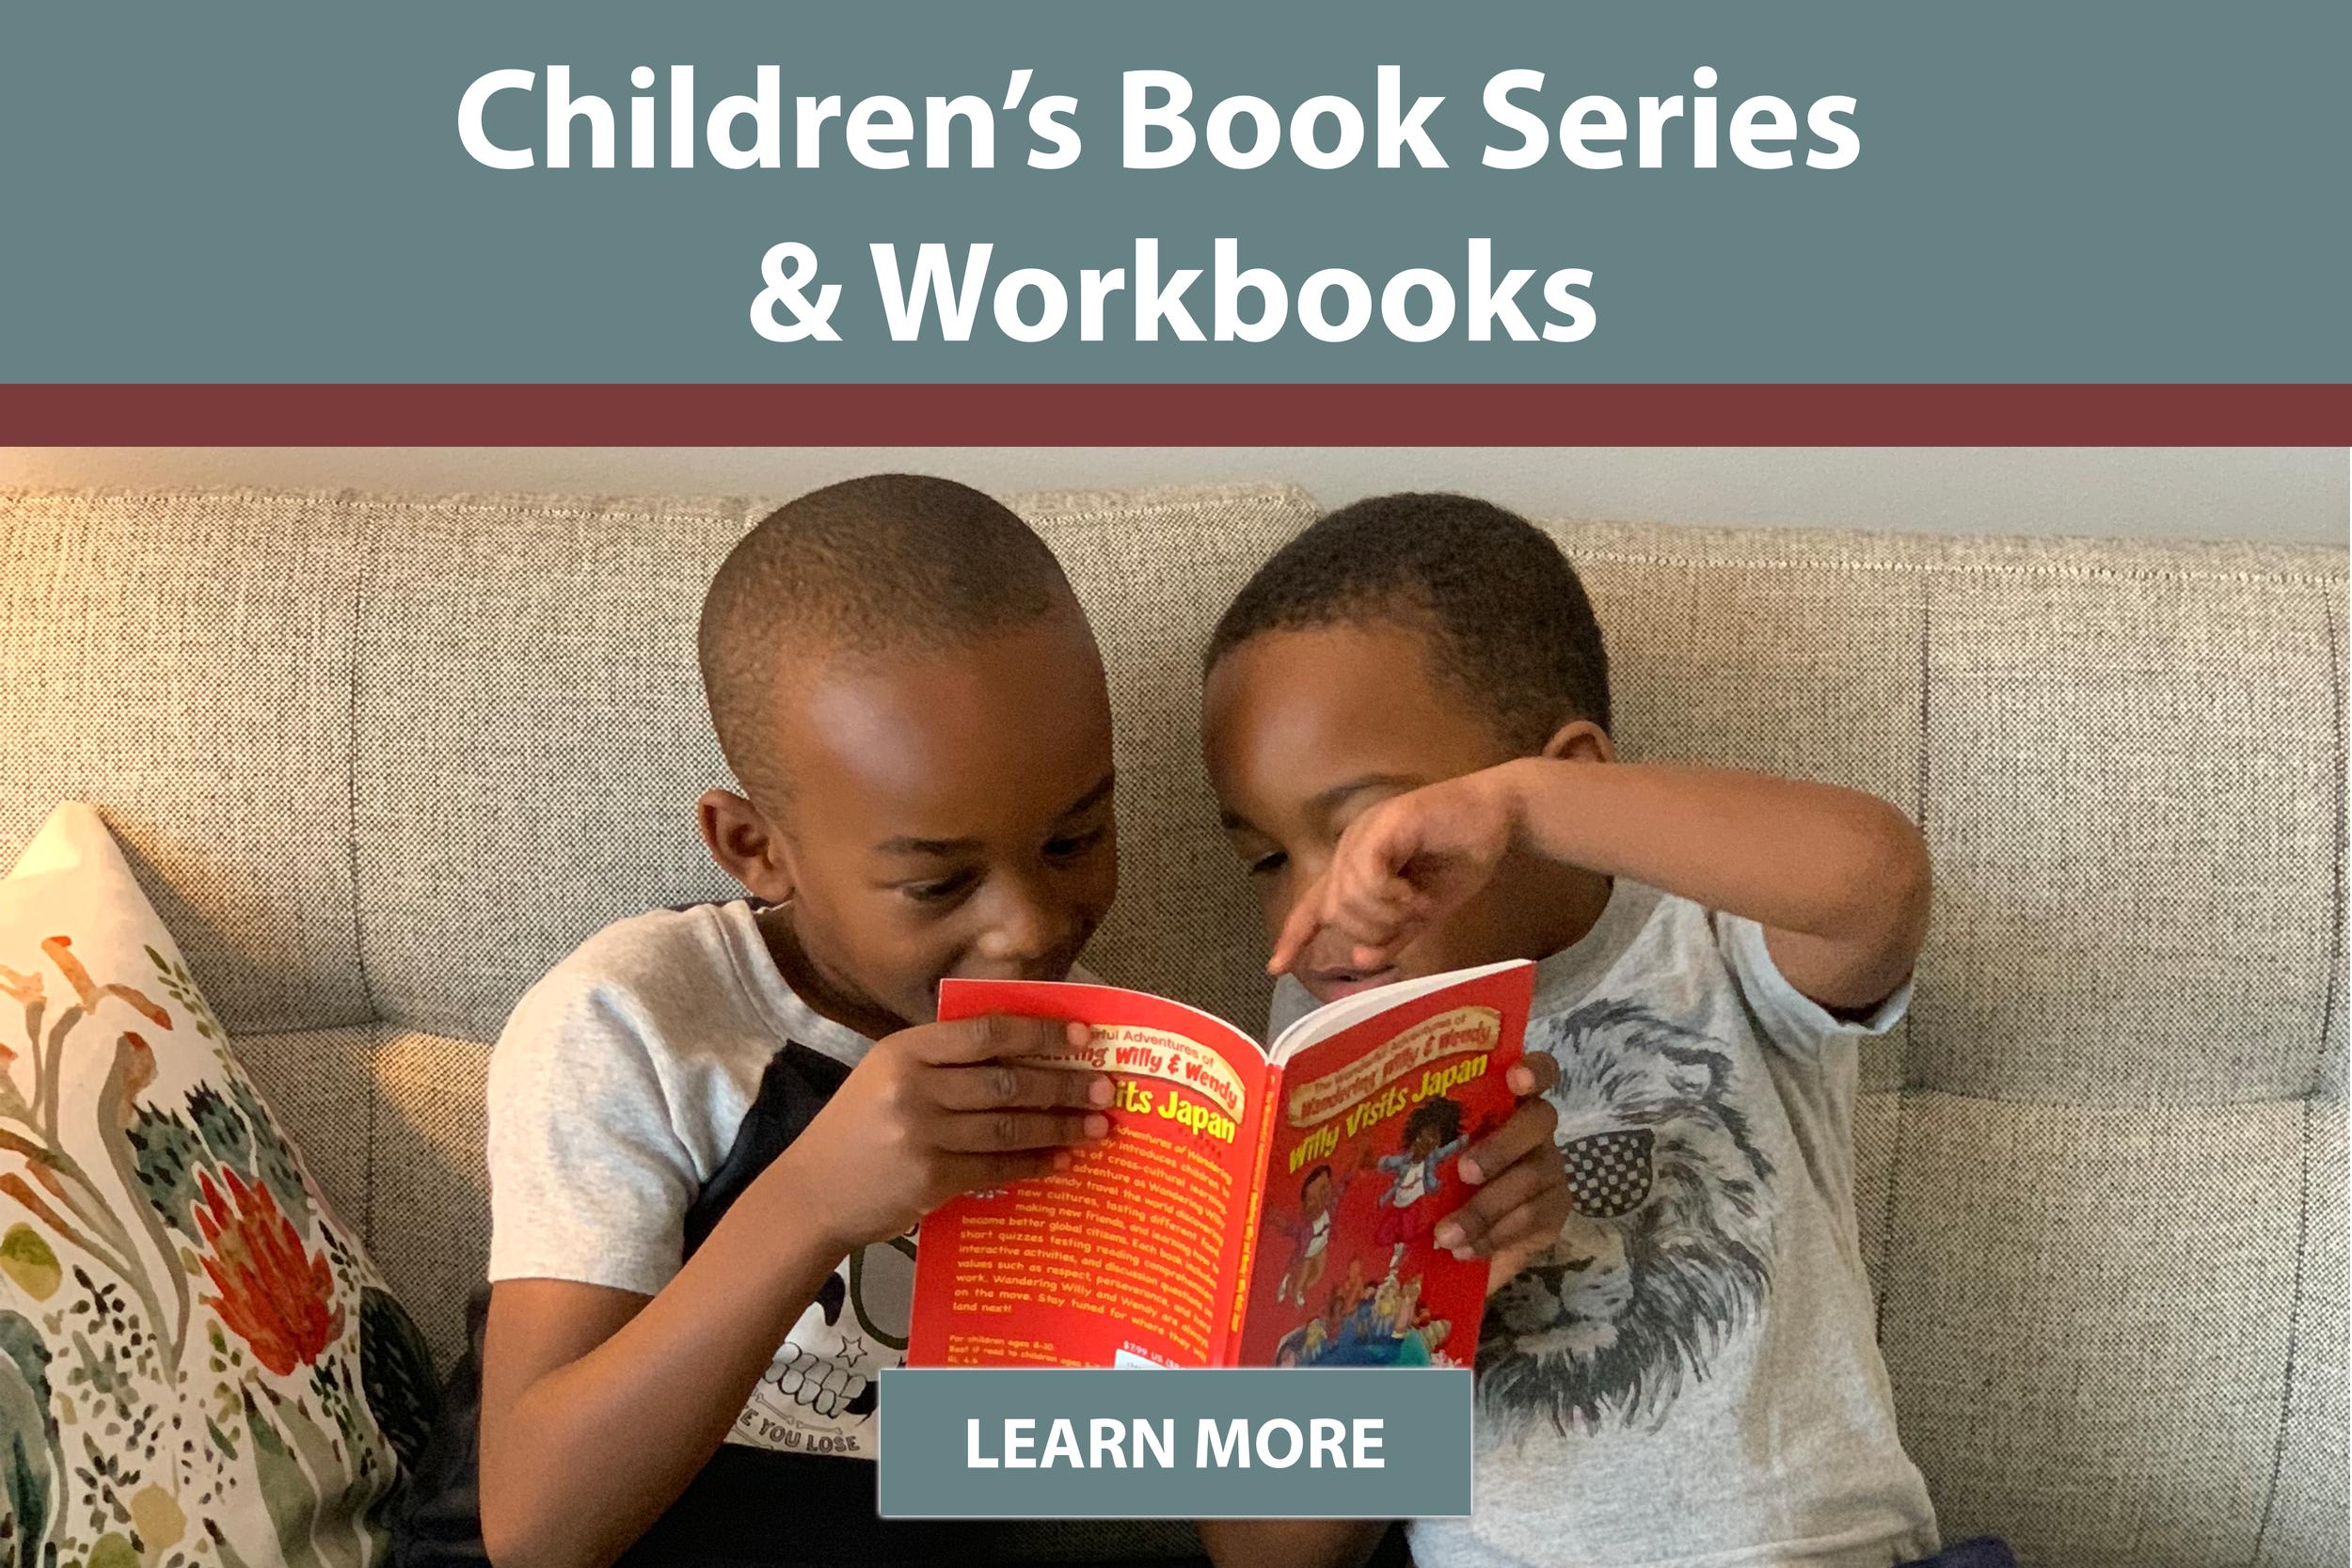 Children's Book Series & Workbooks - Website Image (1).png